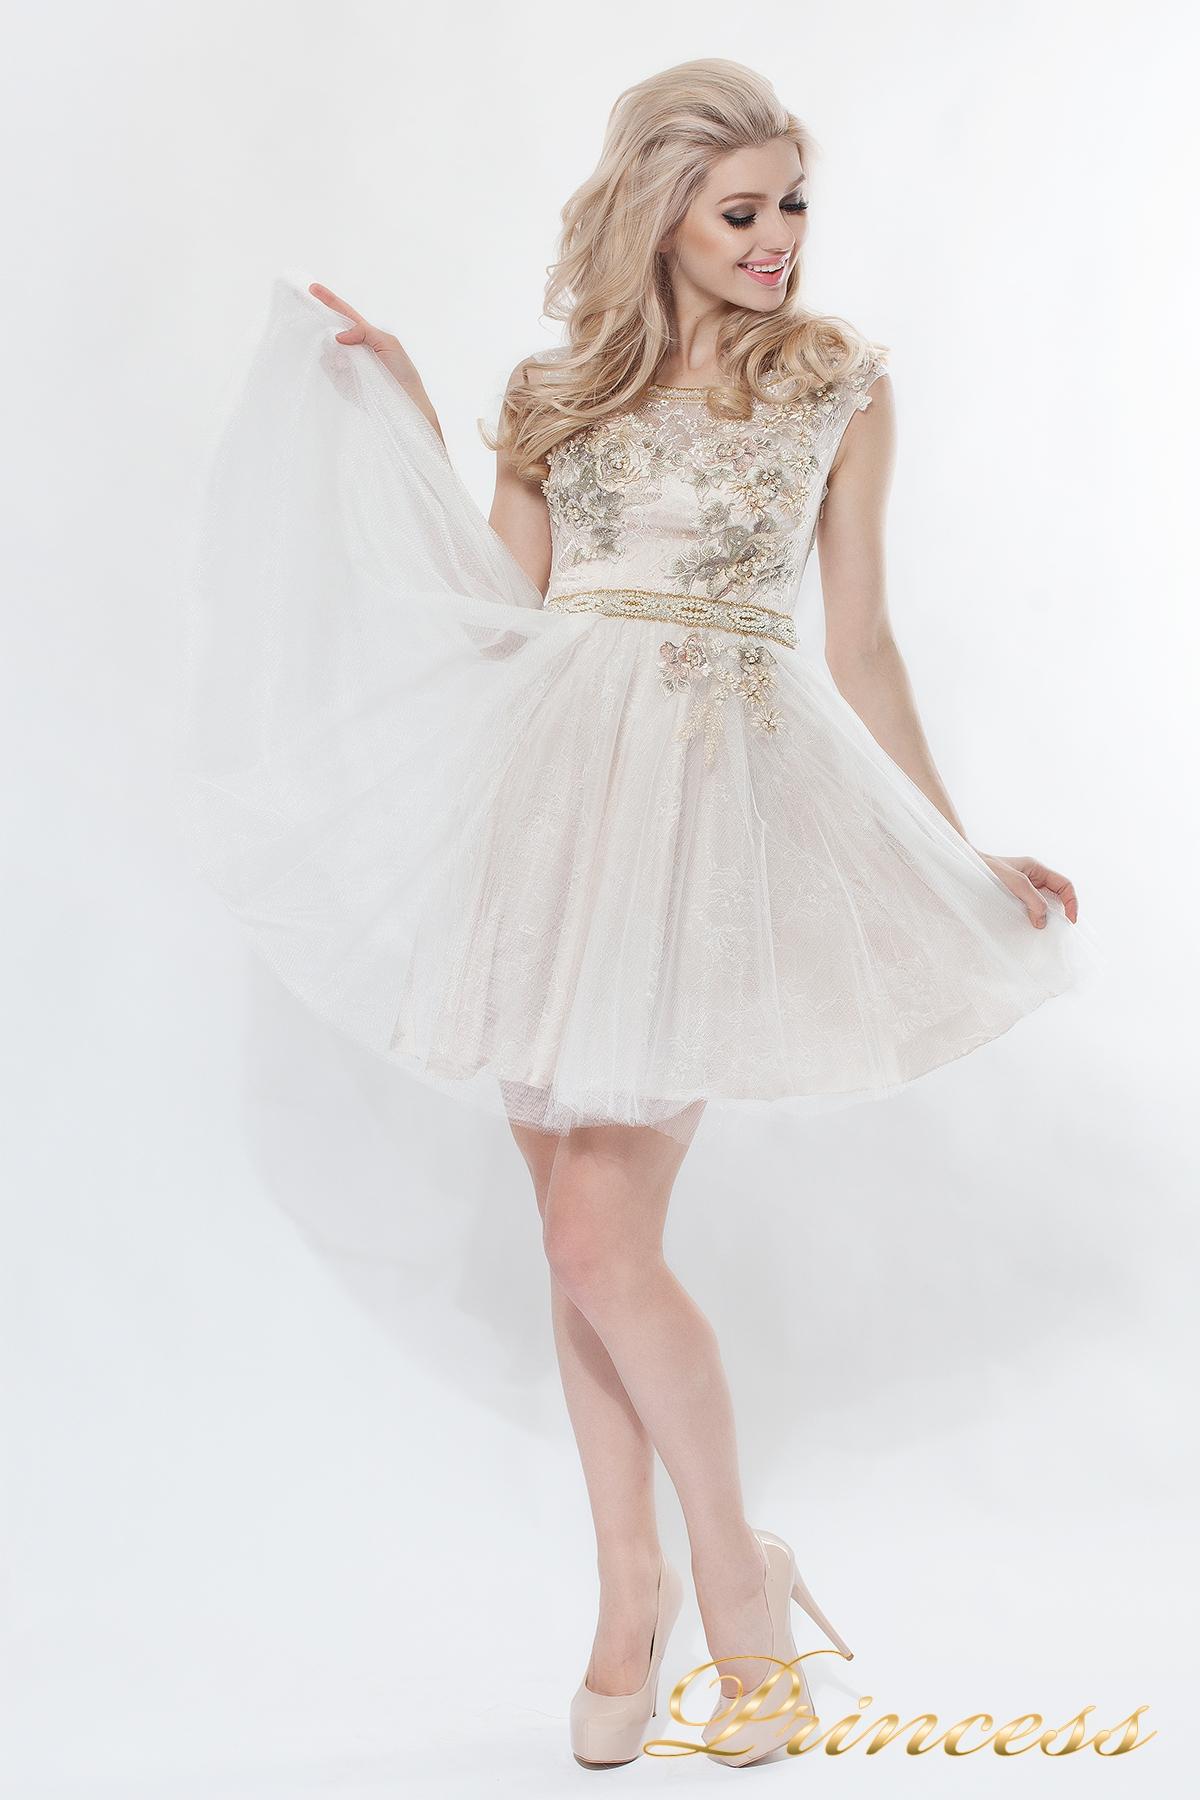 Princess Dress Collection  2017